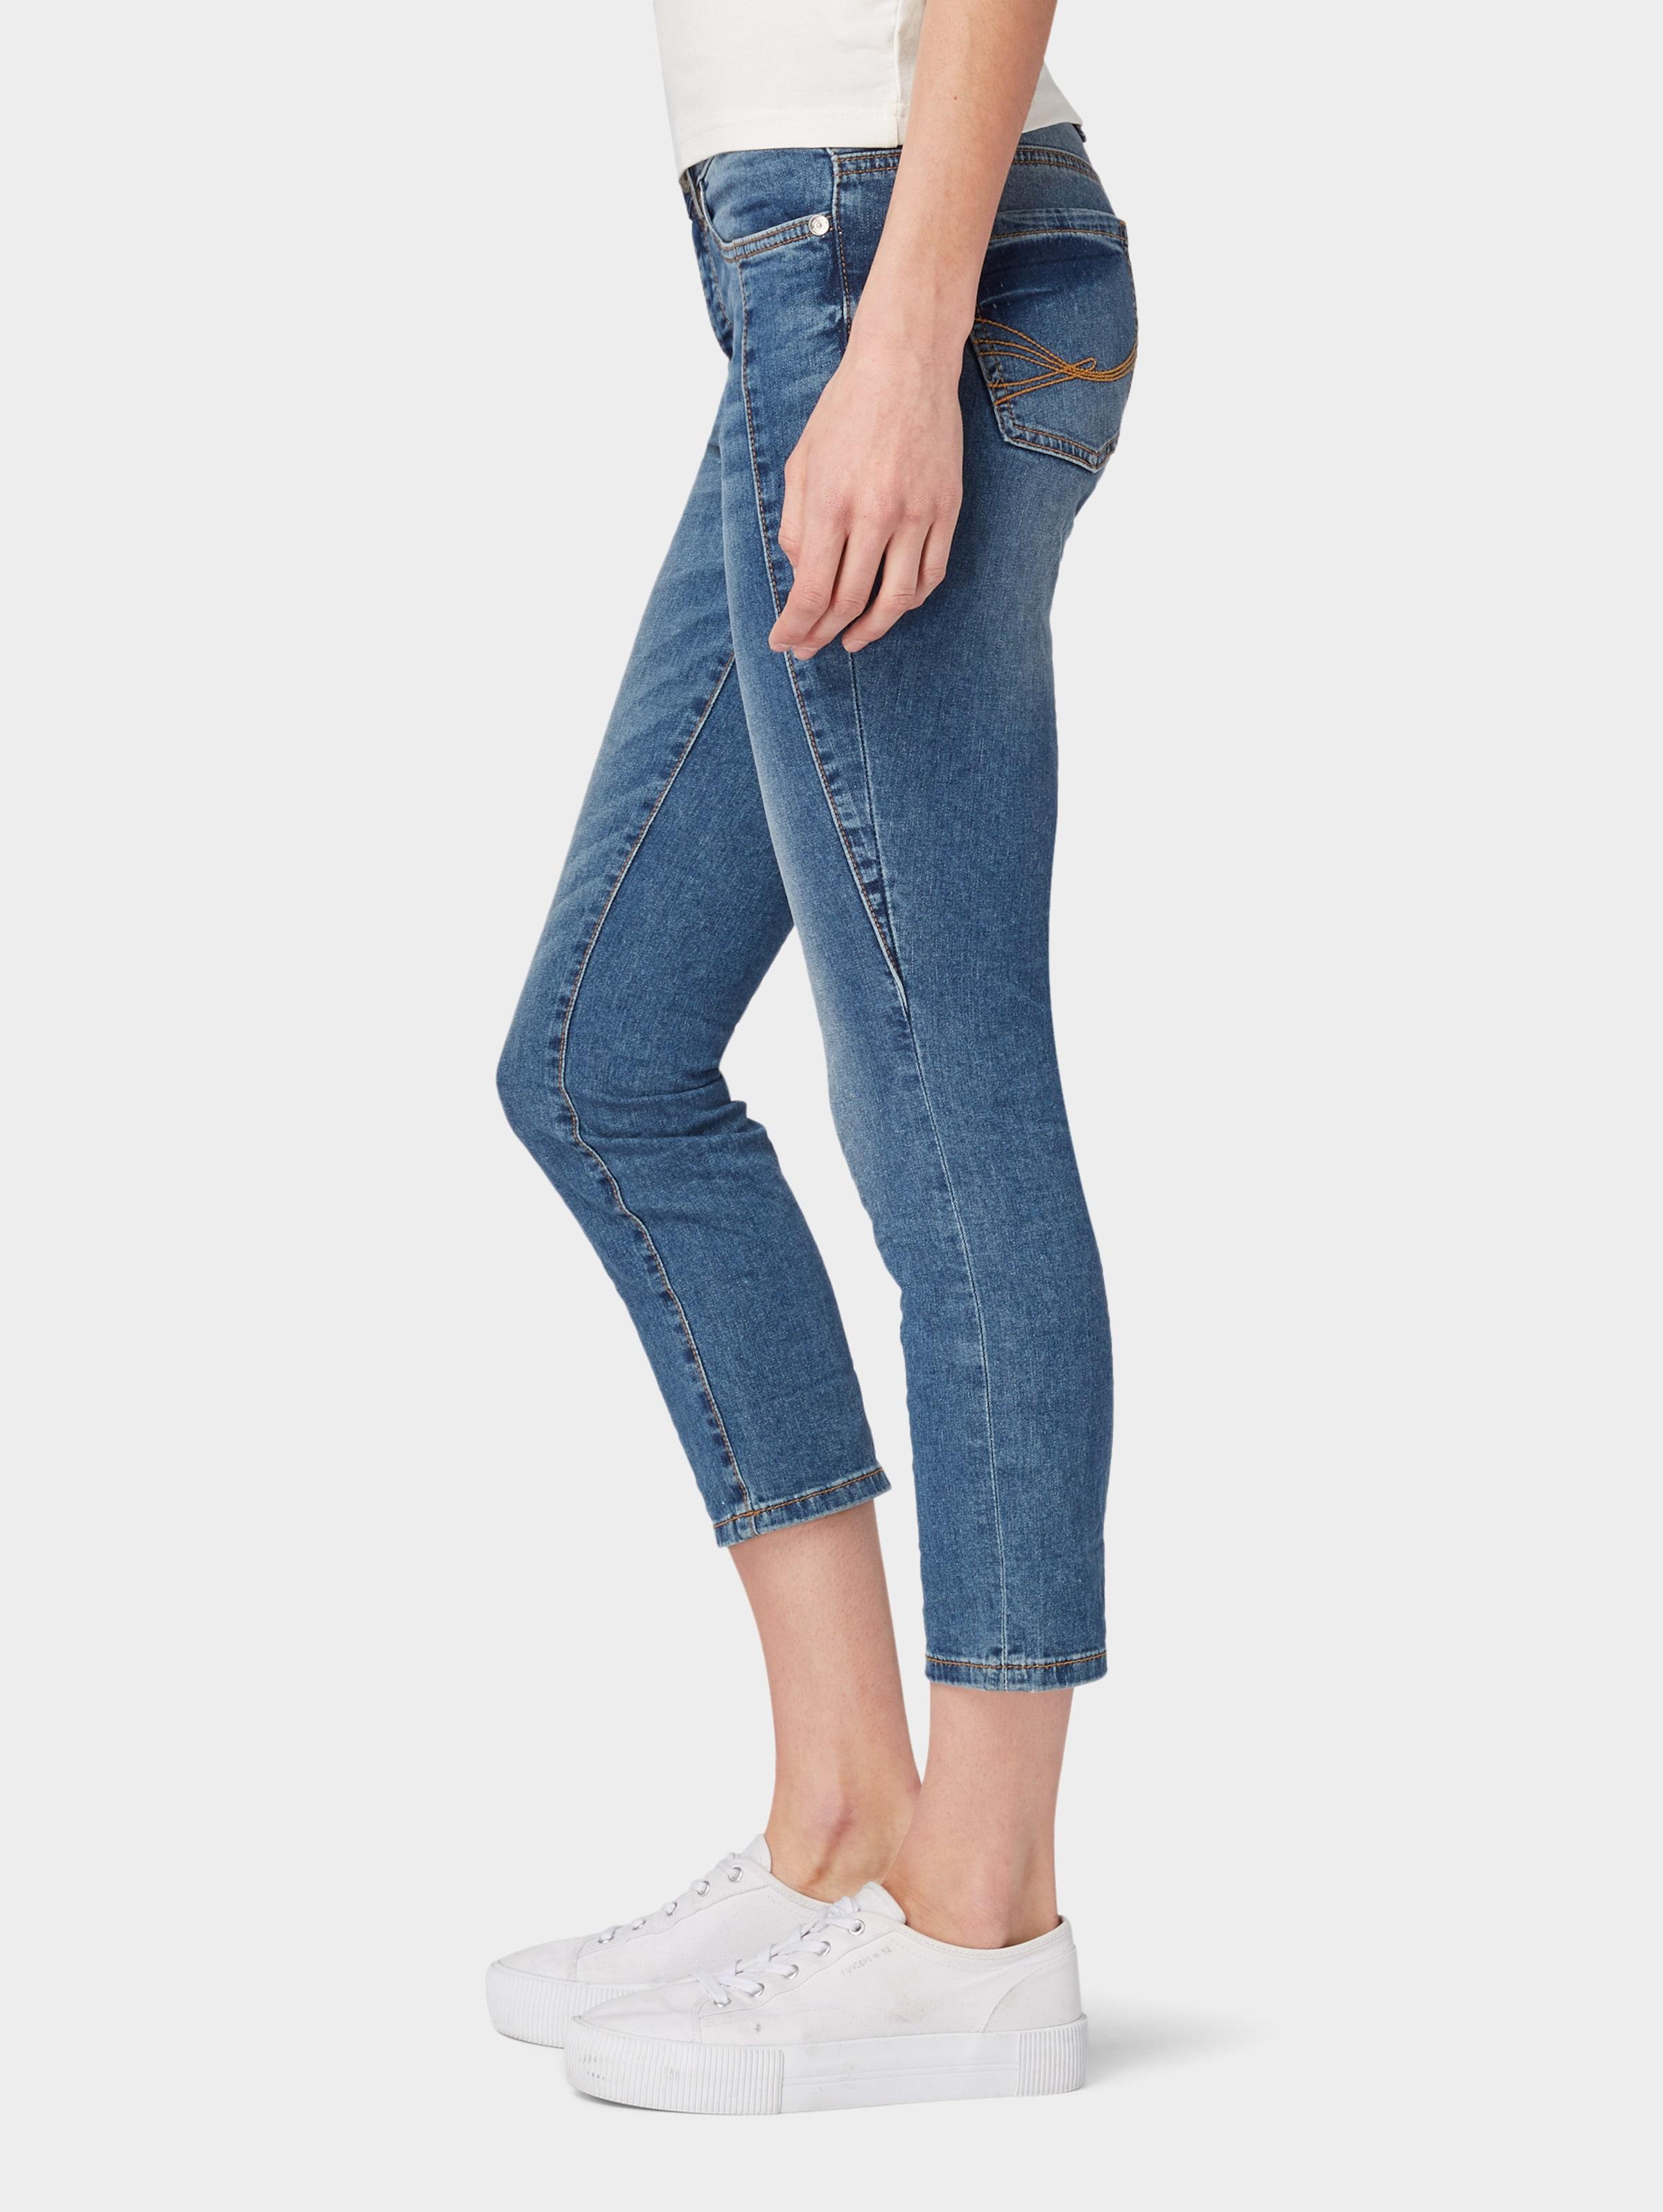 Tailor Blue Jeanshosen In Denim Tom 'alexa' IDHY2WeE9